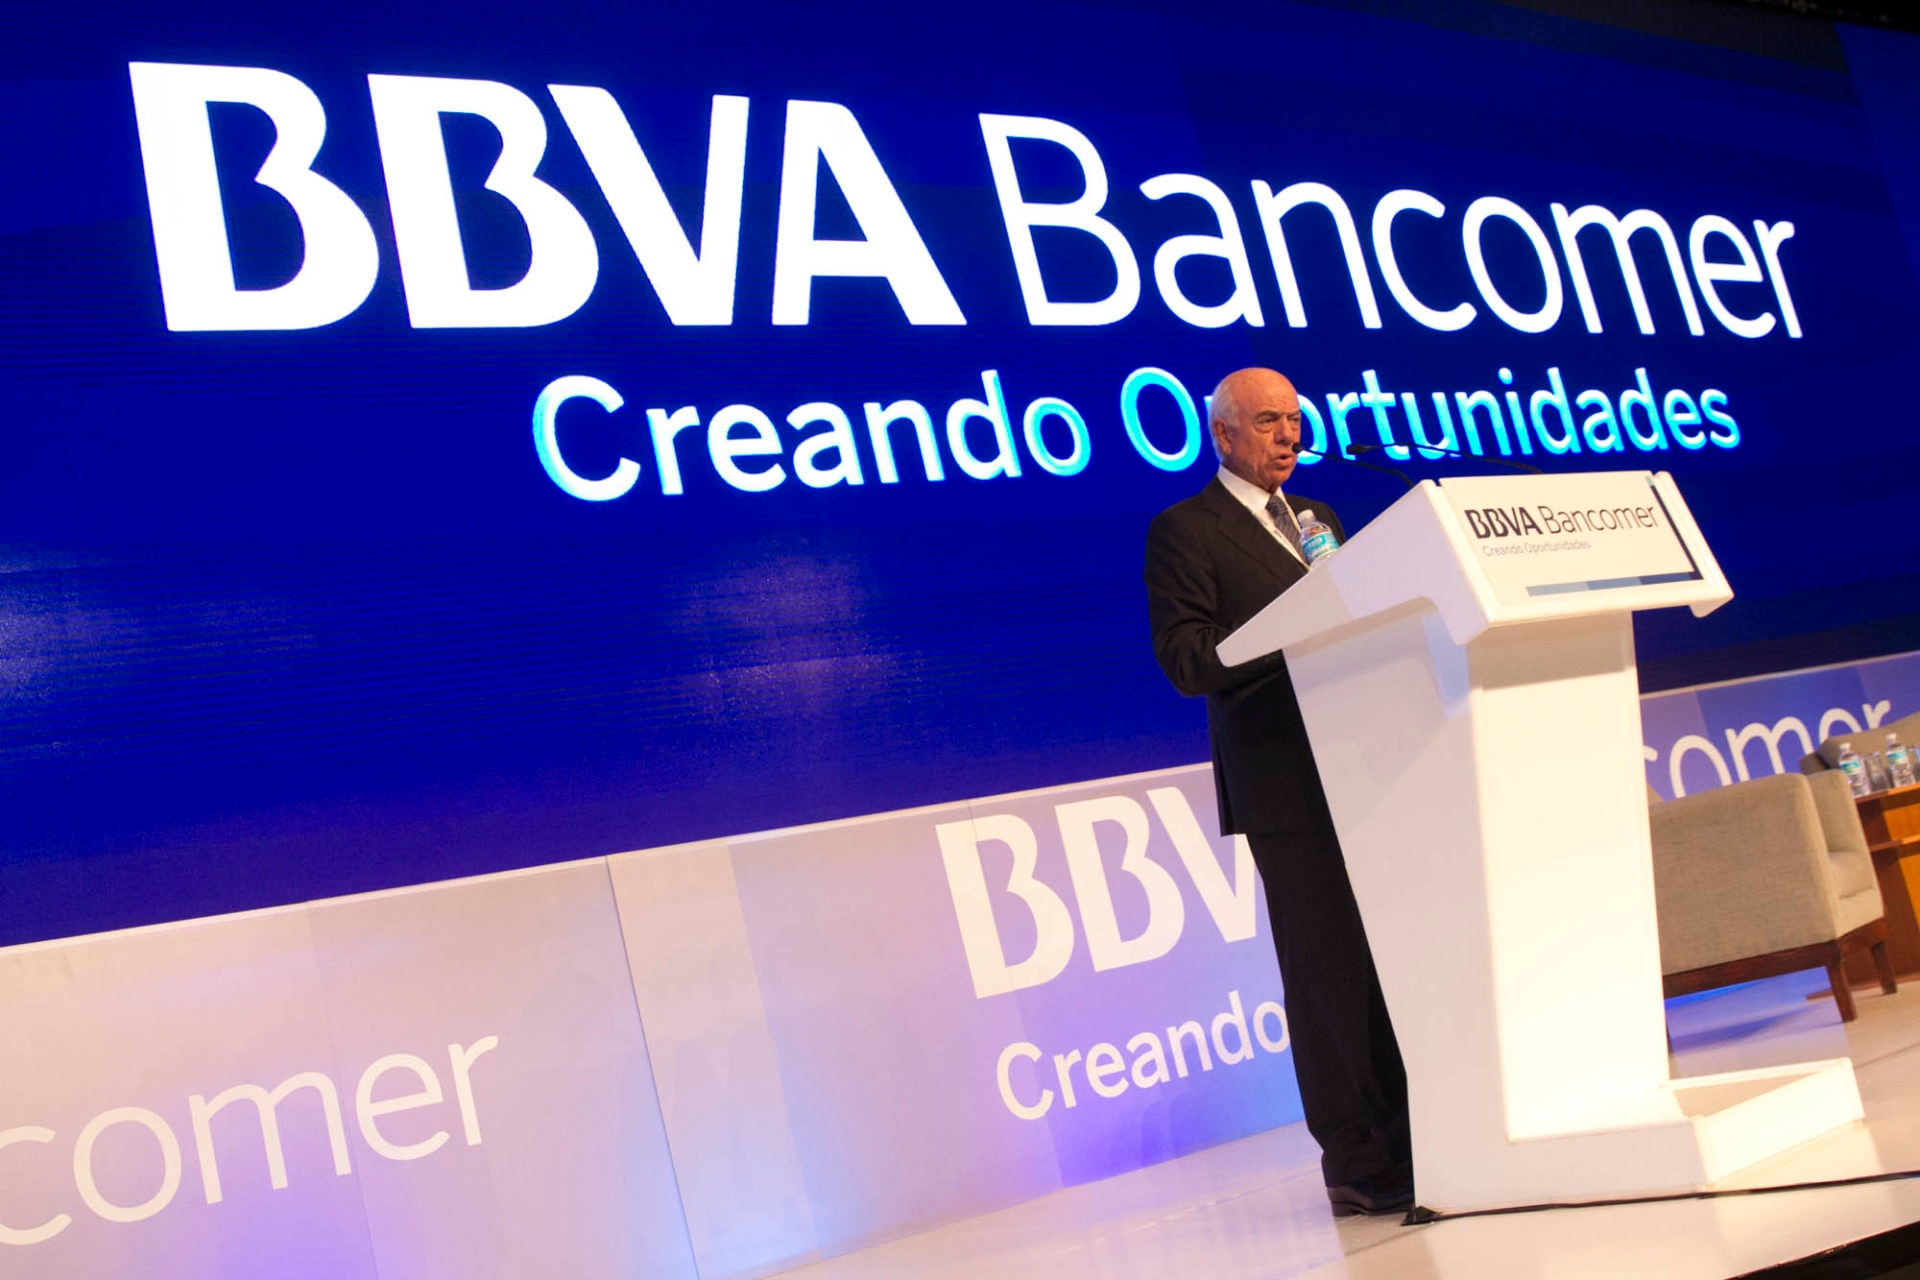 bbva_francisco-gonzalez_-consejo-bbva-bancomer_-4